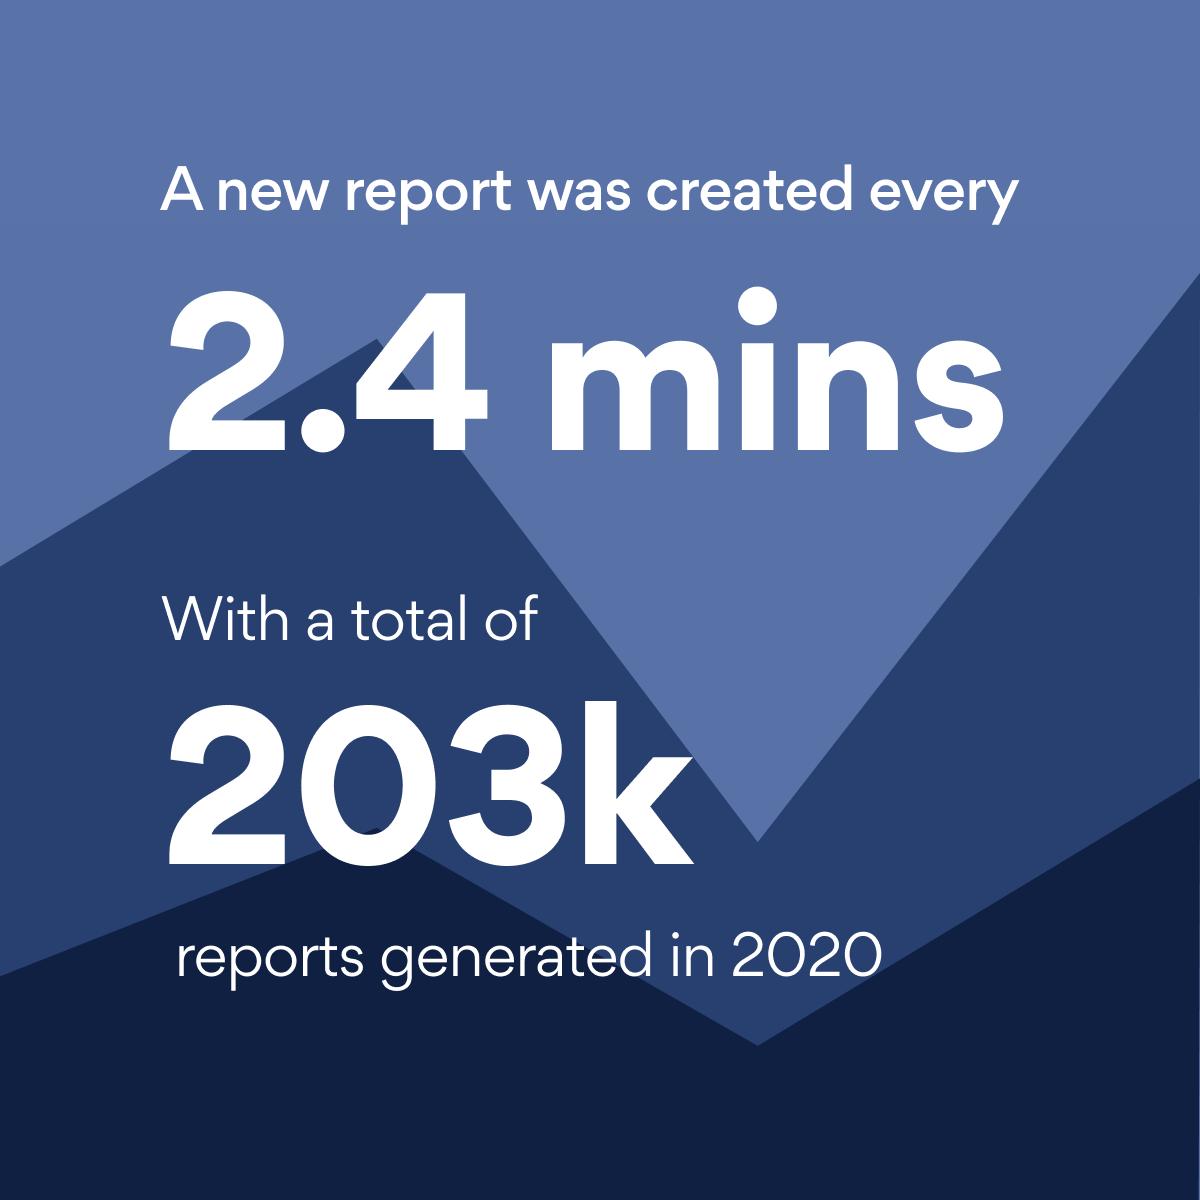 2020 report creating